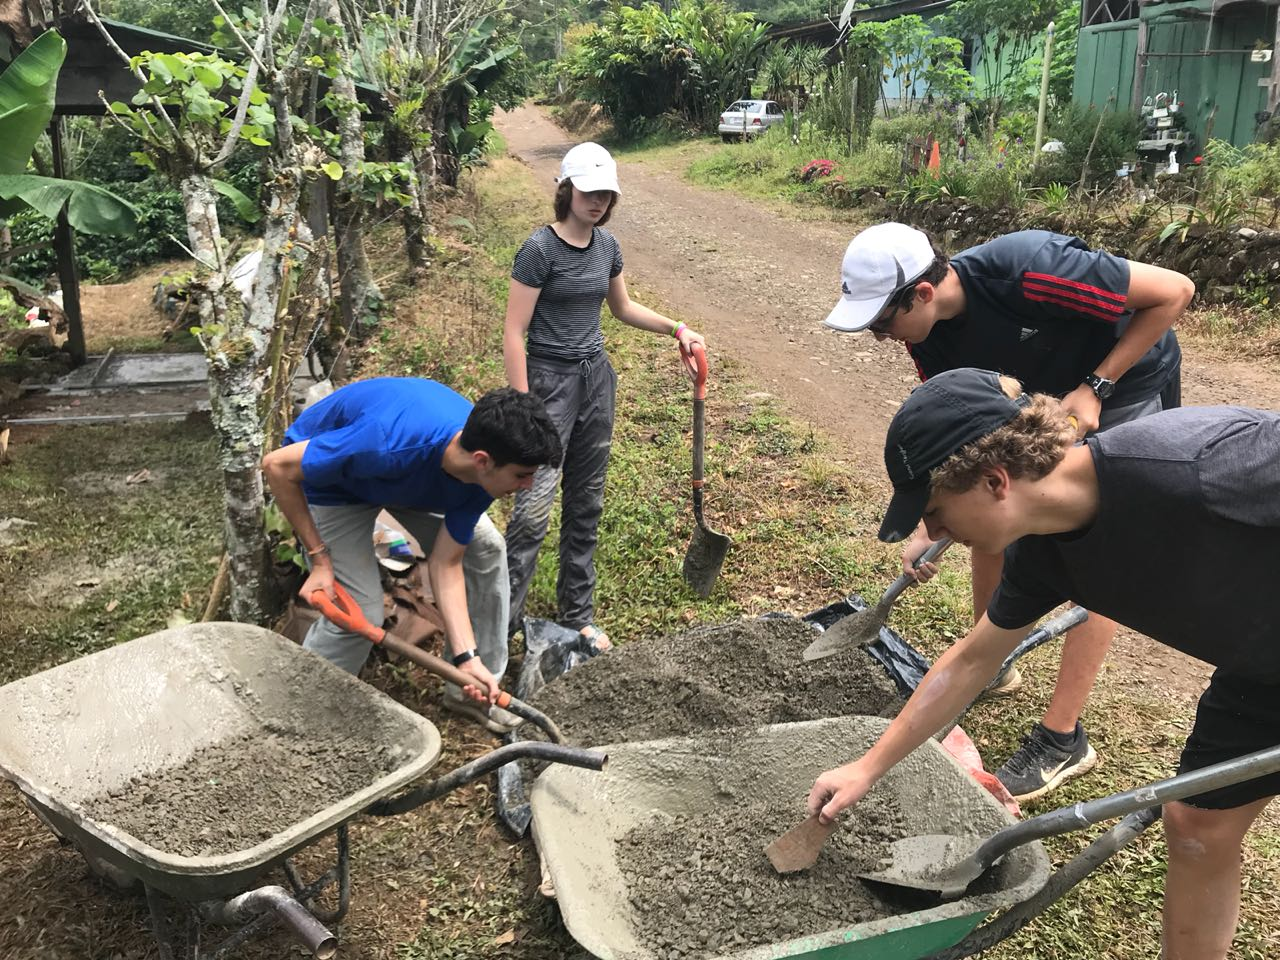 Summer Program - Preserving the Environment | Global Works - Costa Rica: Language & Leadership